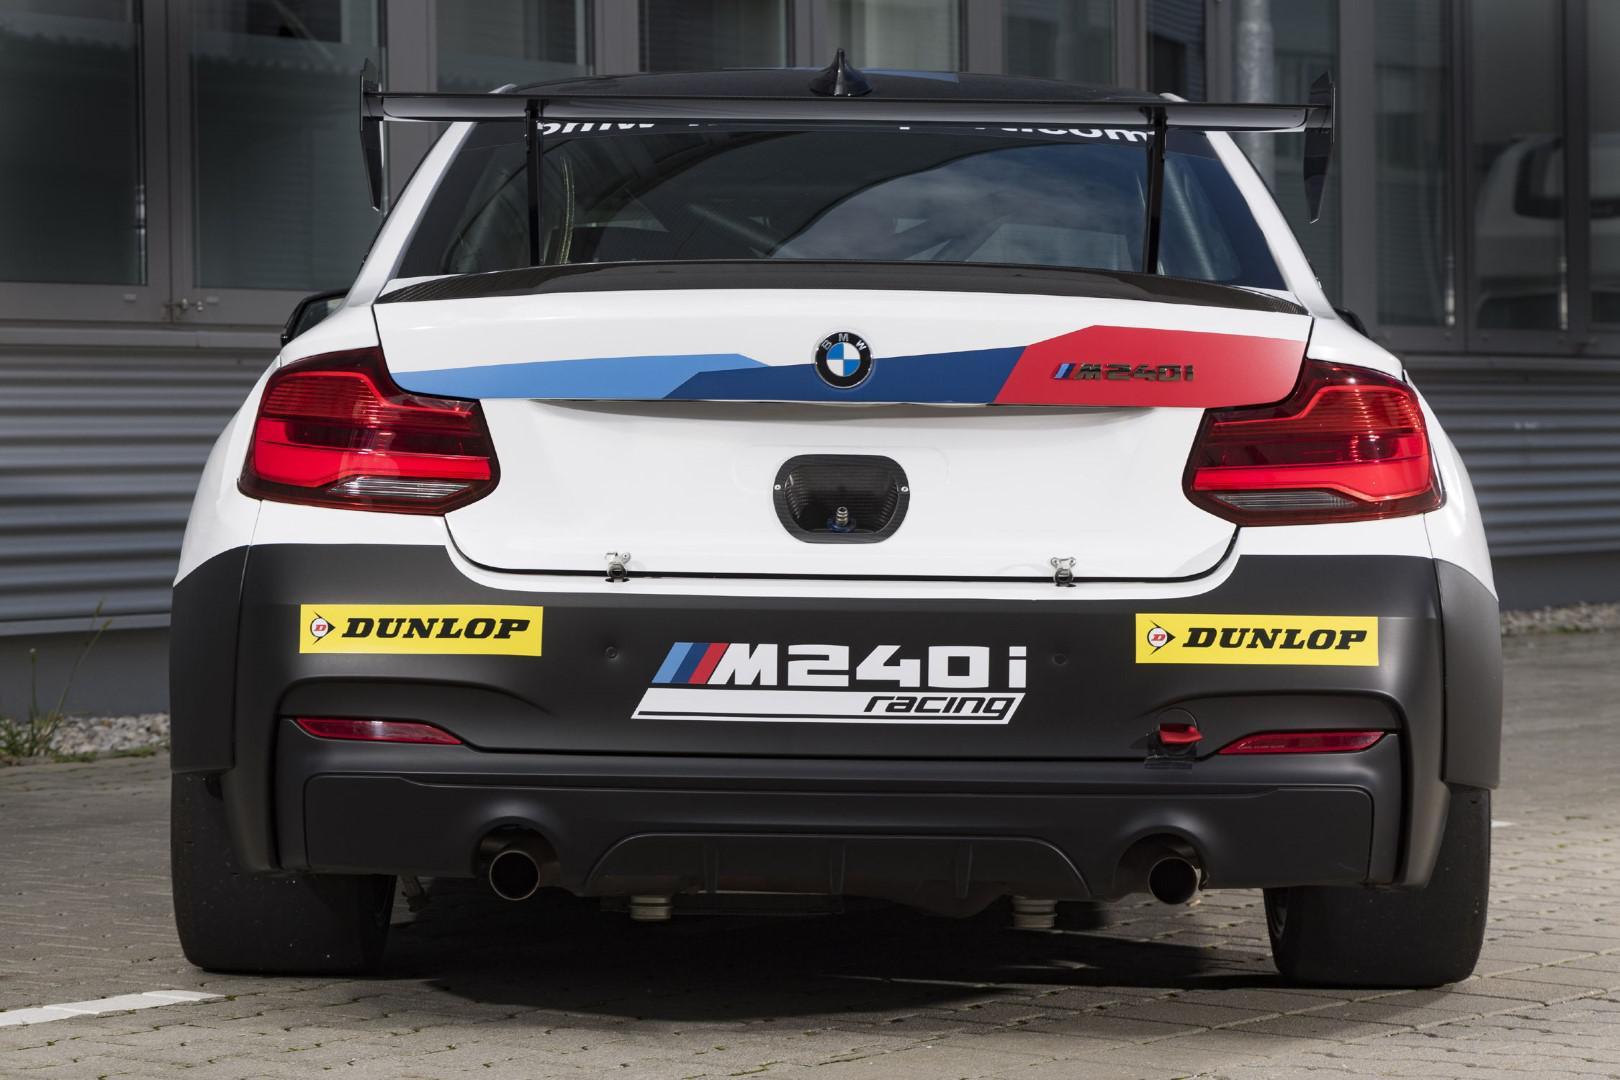 bmw-m235i-racing-cup-pack-evo-877-1.jpg